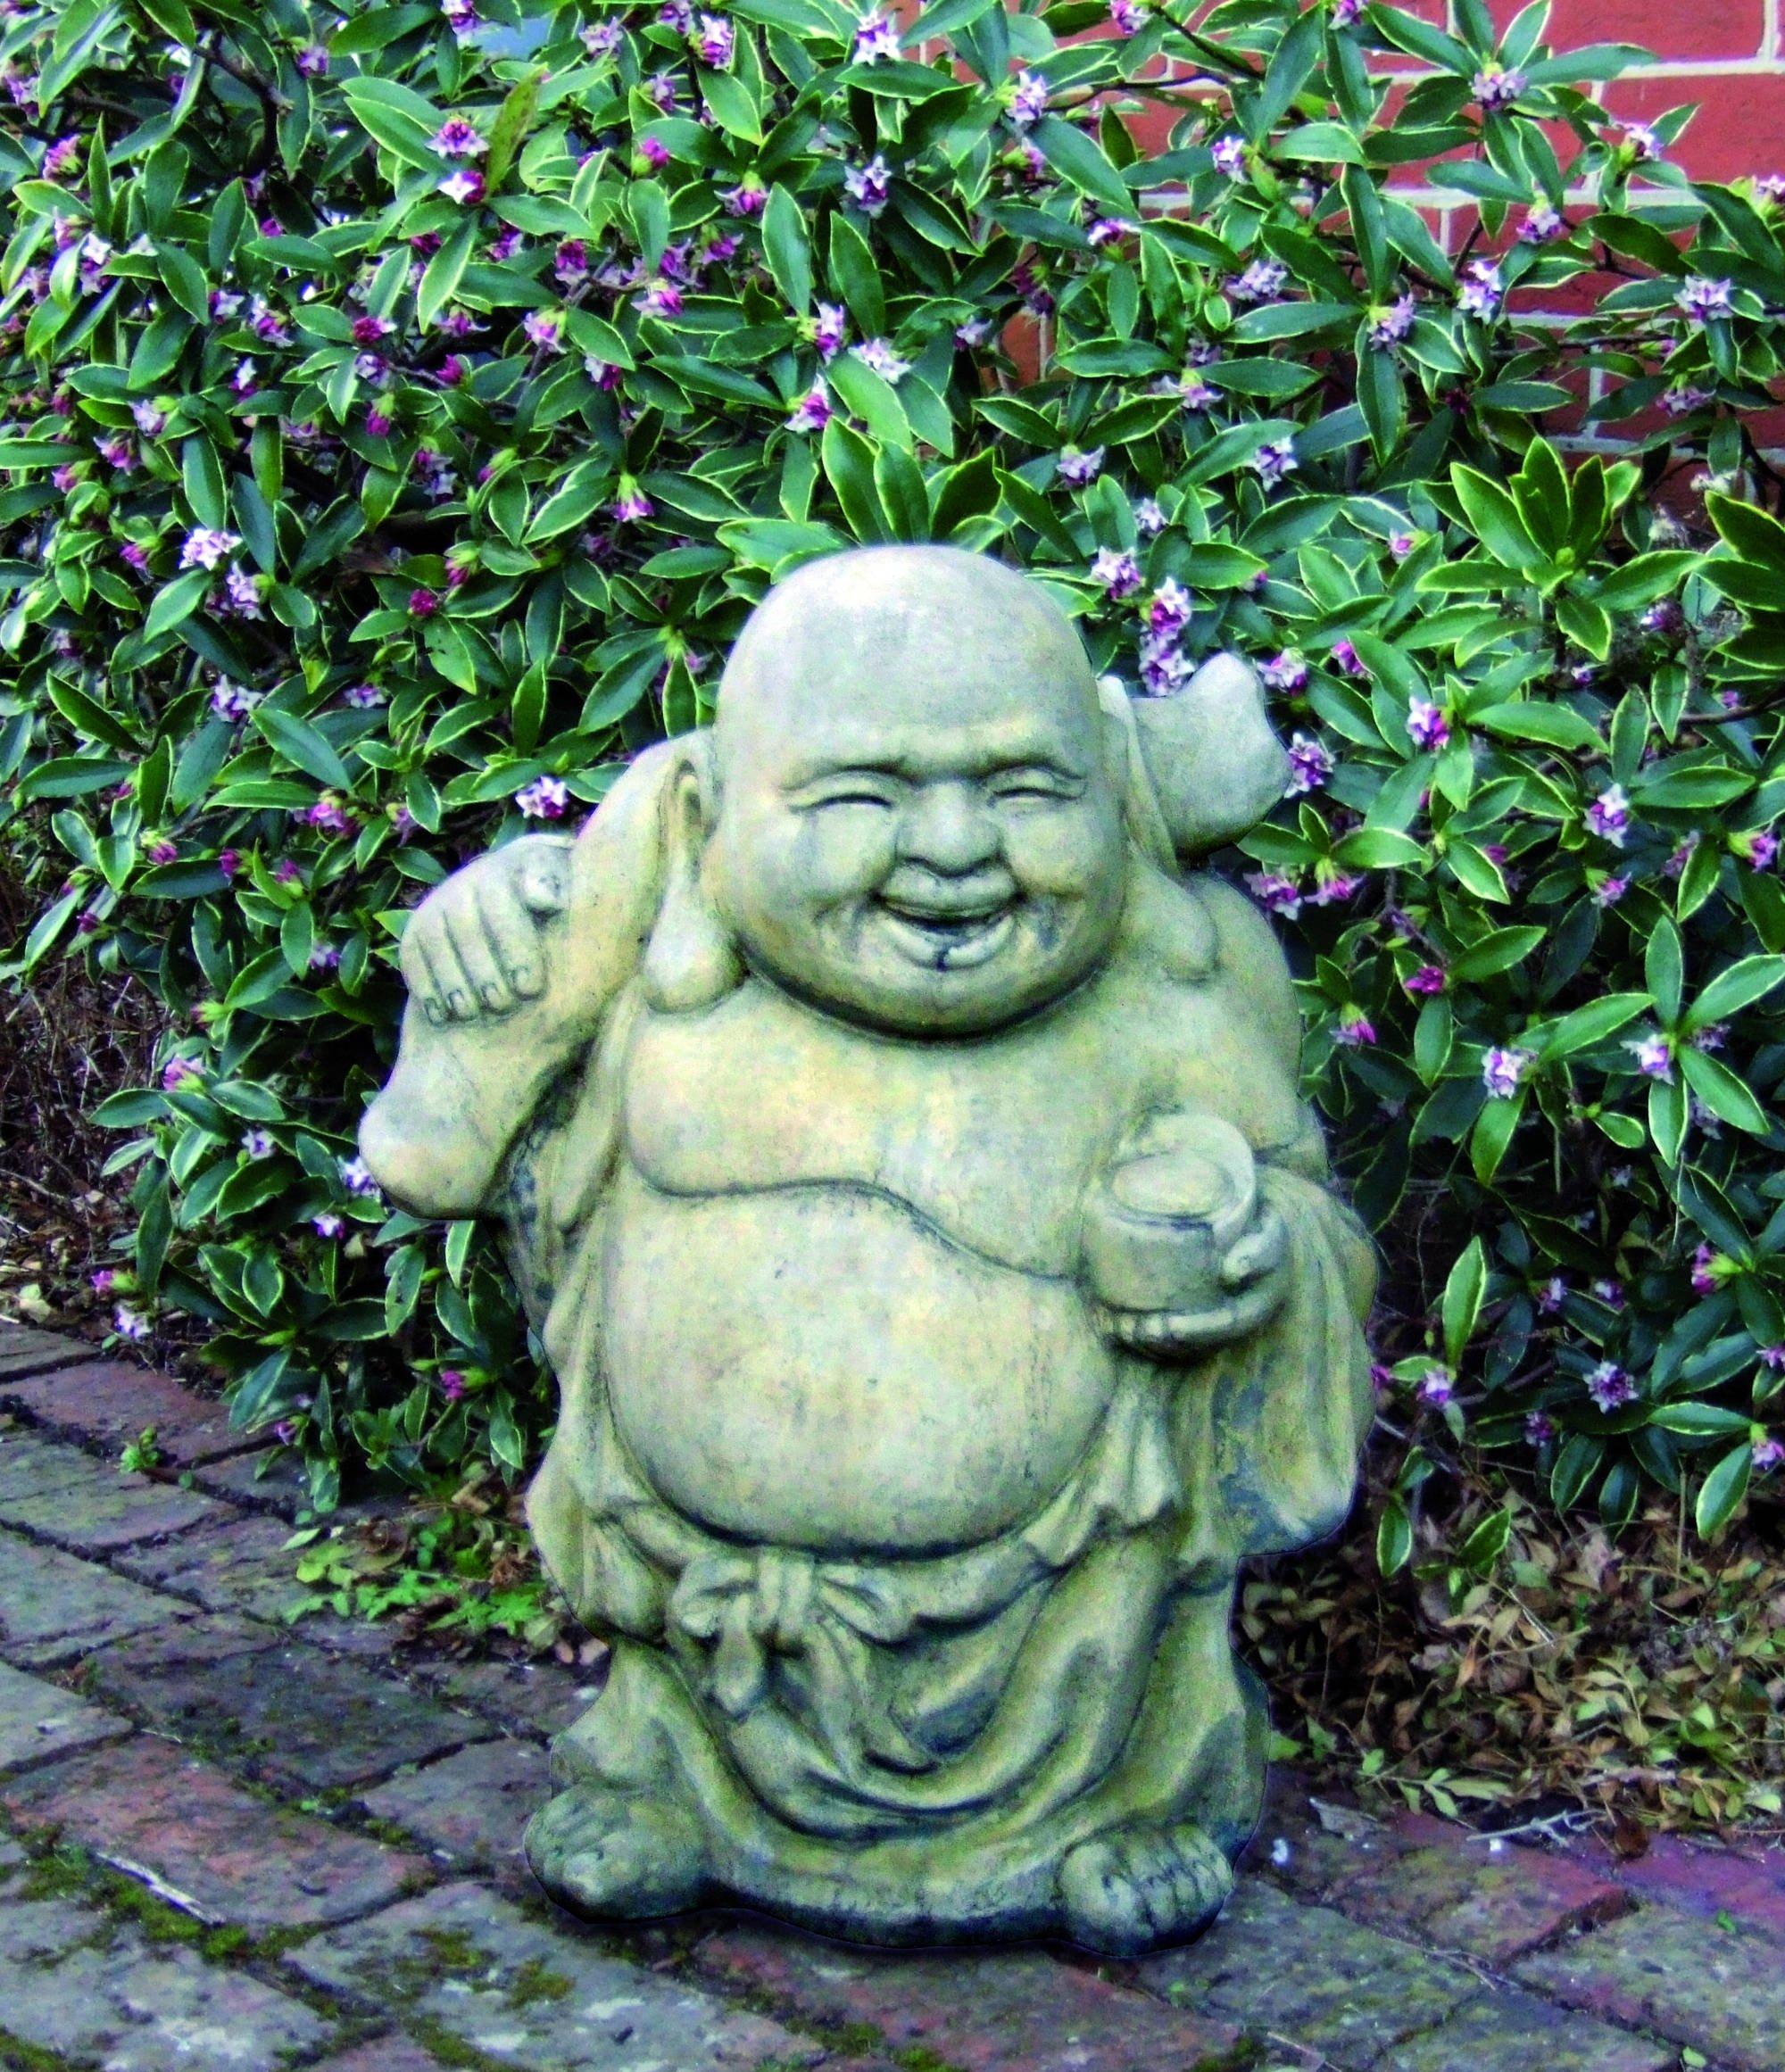 Large Travelling Buddha Statue Garden Ornamnents